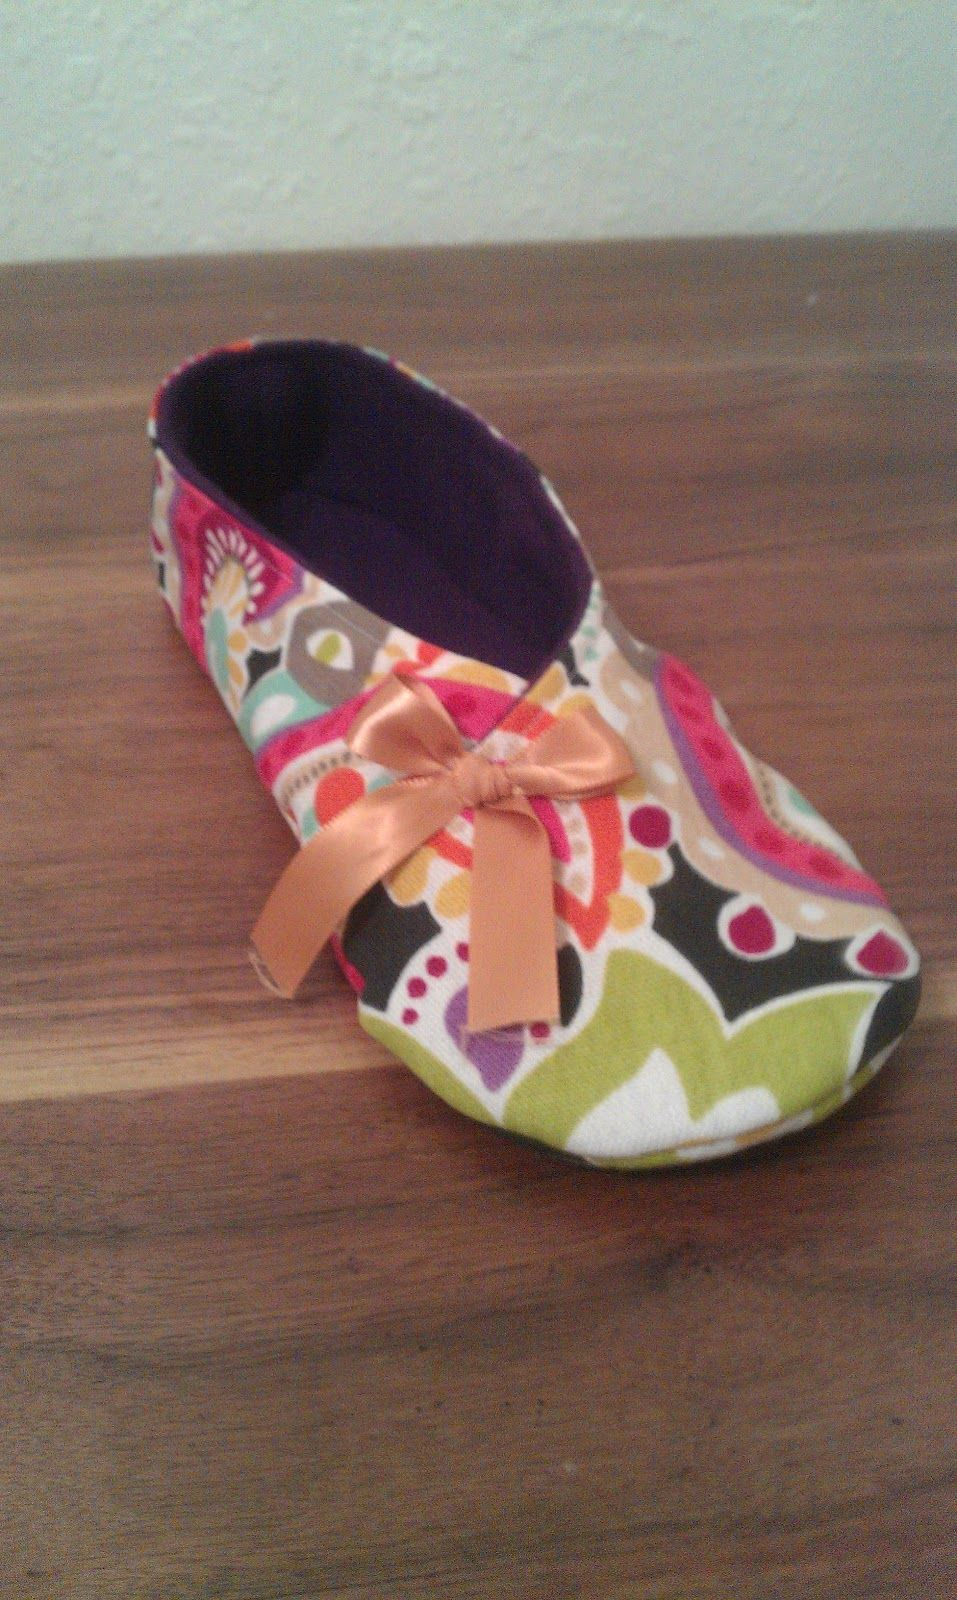 Lauren E Fabrications: Kimono Slipper Tutorial, might be a great ...